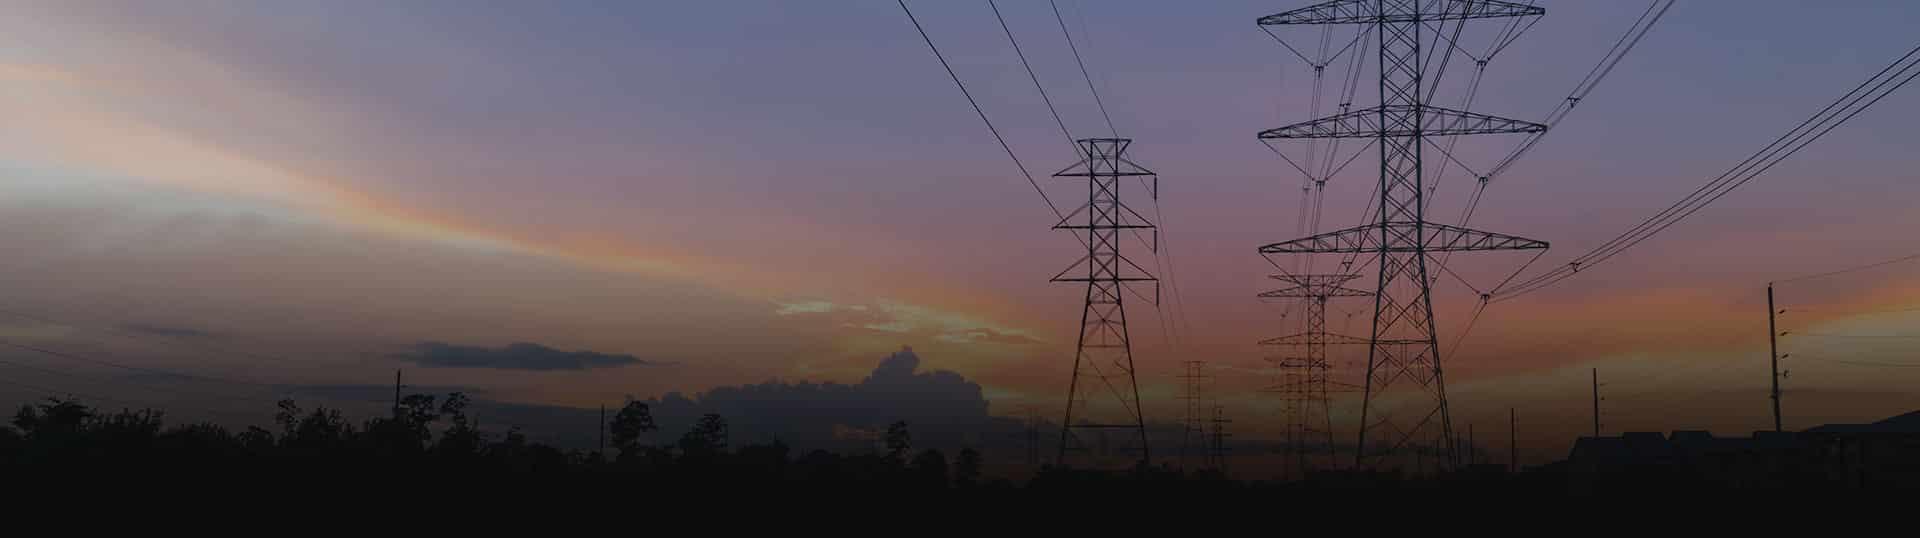 power line hero image